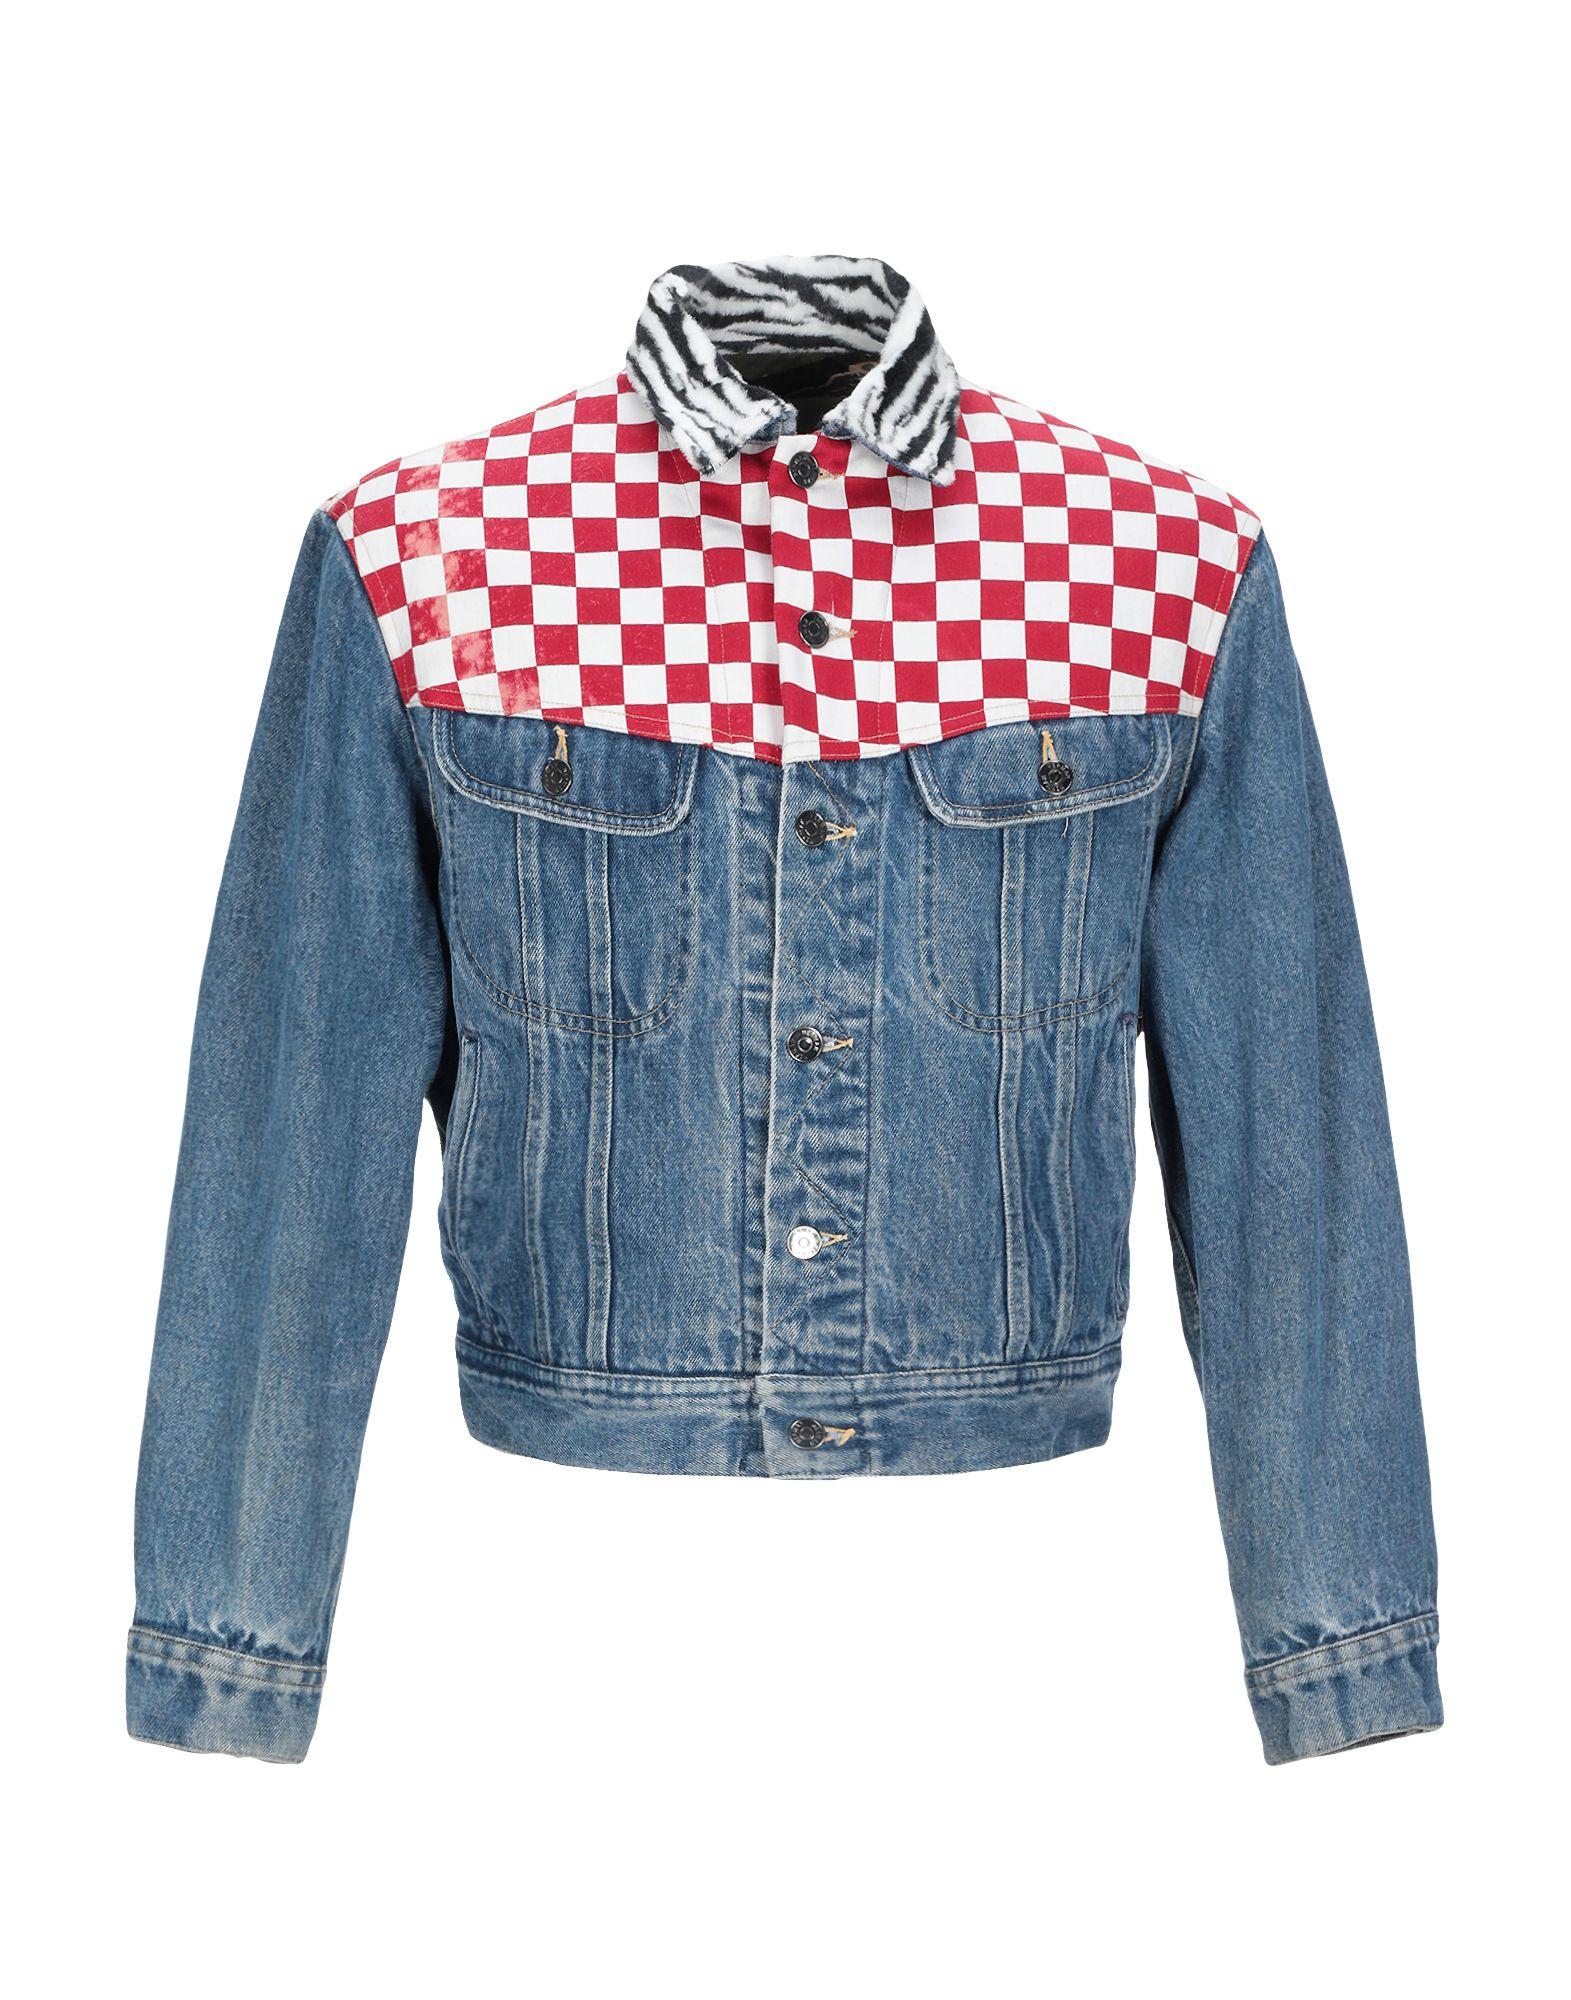 HERMAN MARKET Джинсовая верхняя одежда herman market футболка